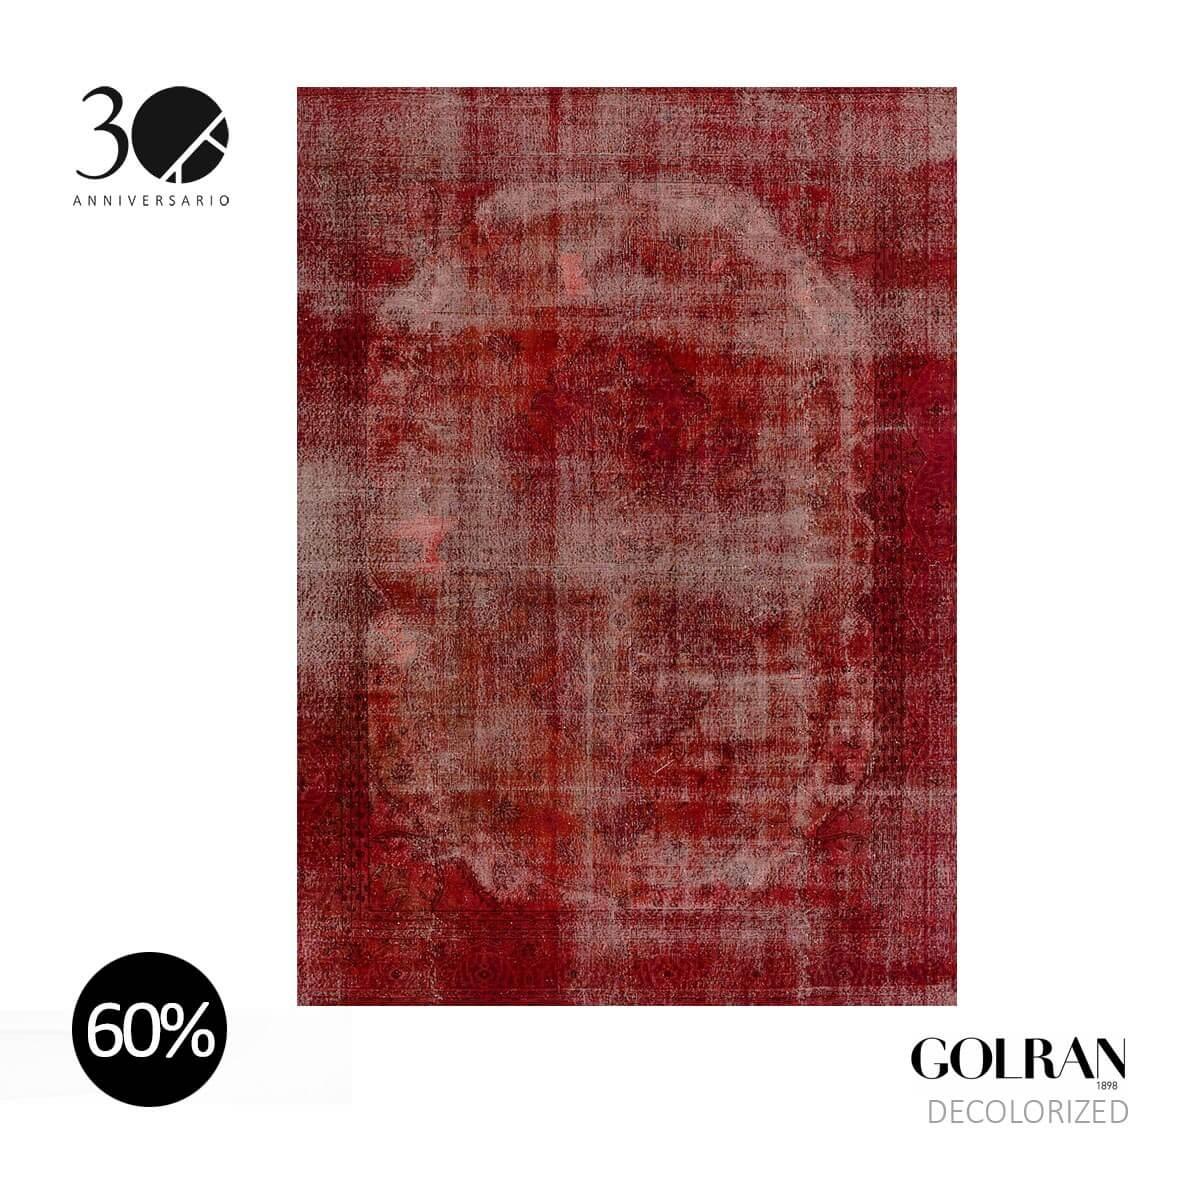 GOLRAN - DECOLORIZED